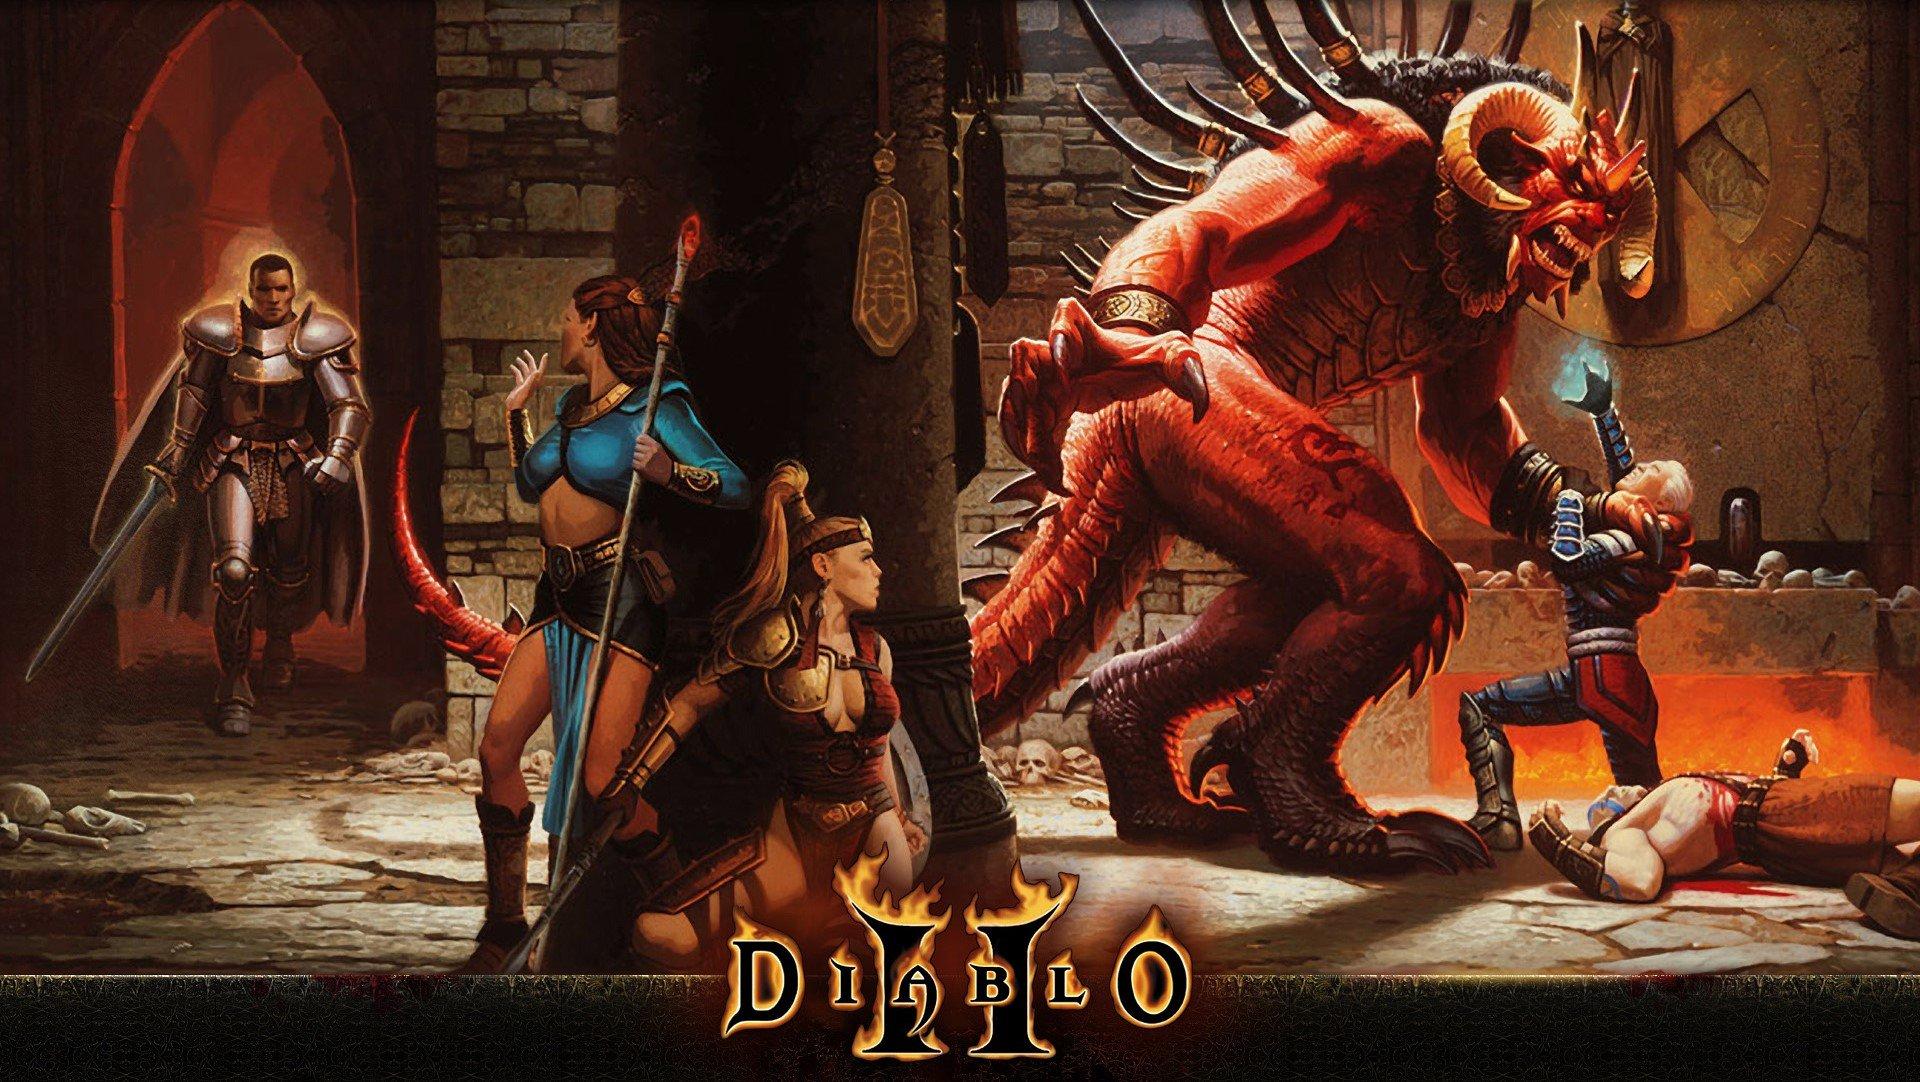 Diablo cody nude fucks scene